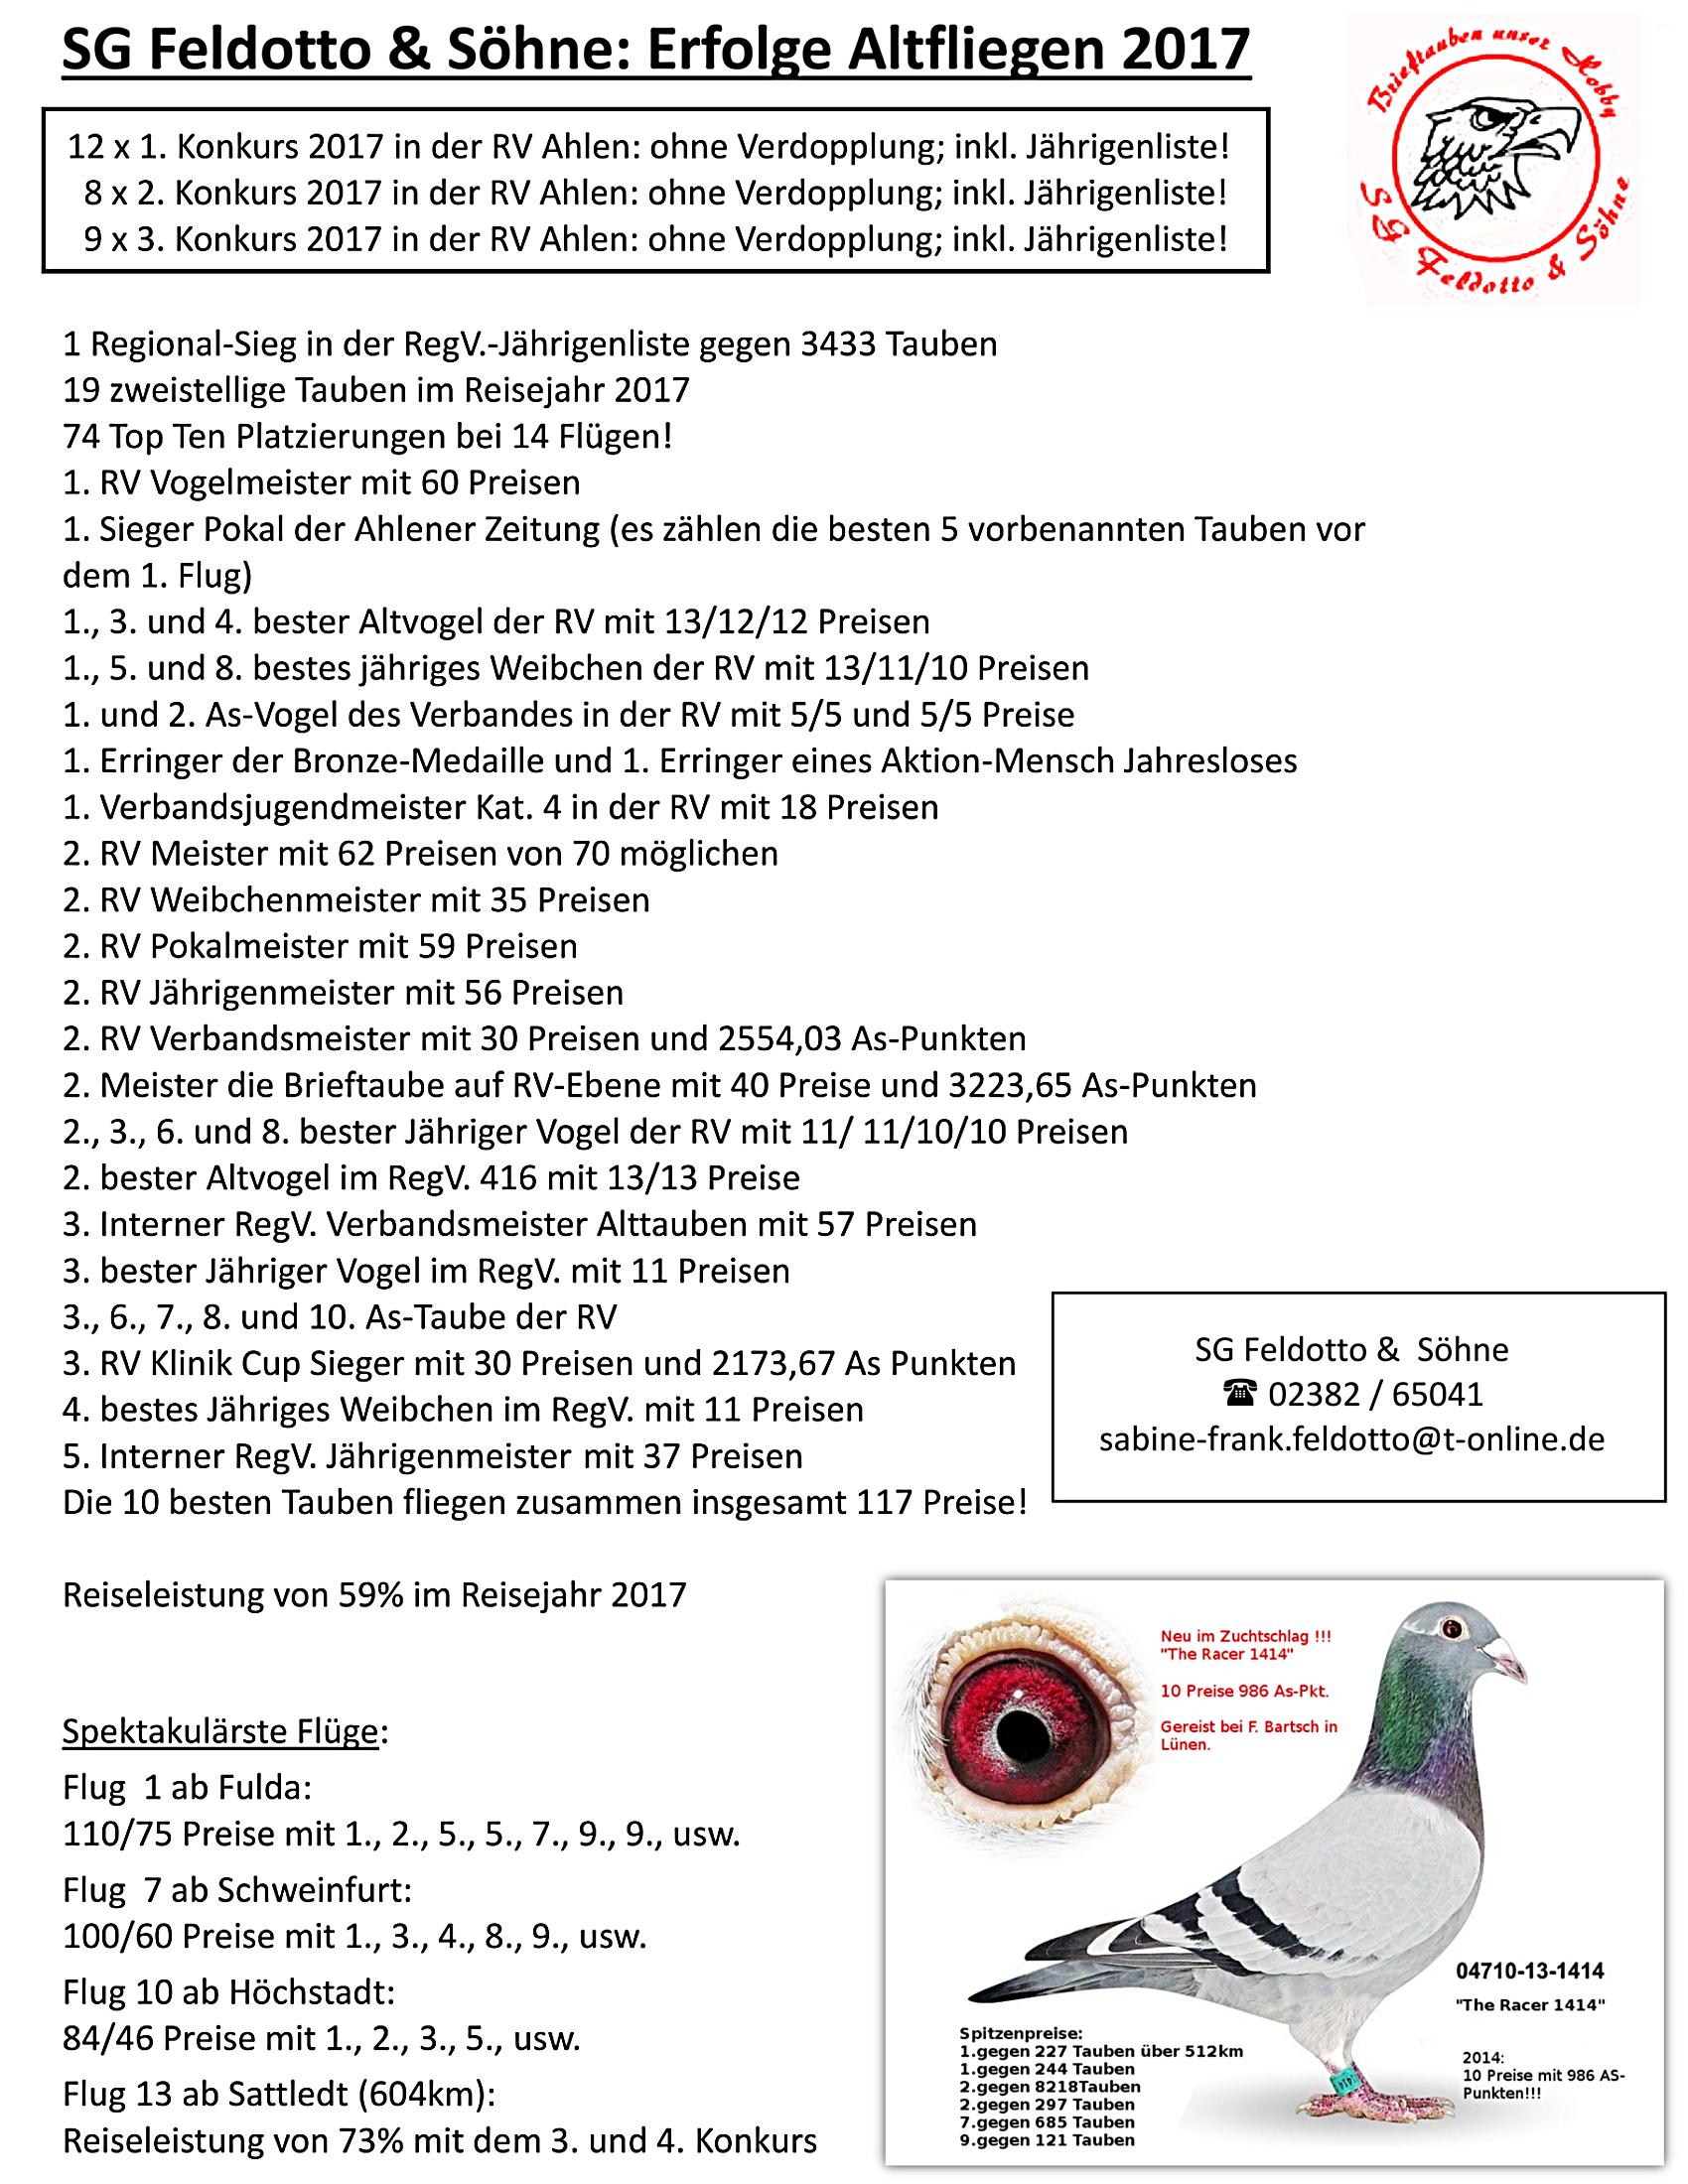 https://i.ibb.co/QQnSVds/SG-Feldotto-S-hne-Erfolge-Altfliegen-2017.jpg